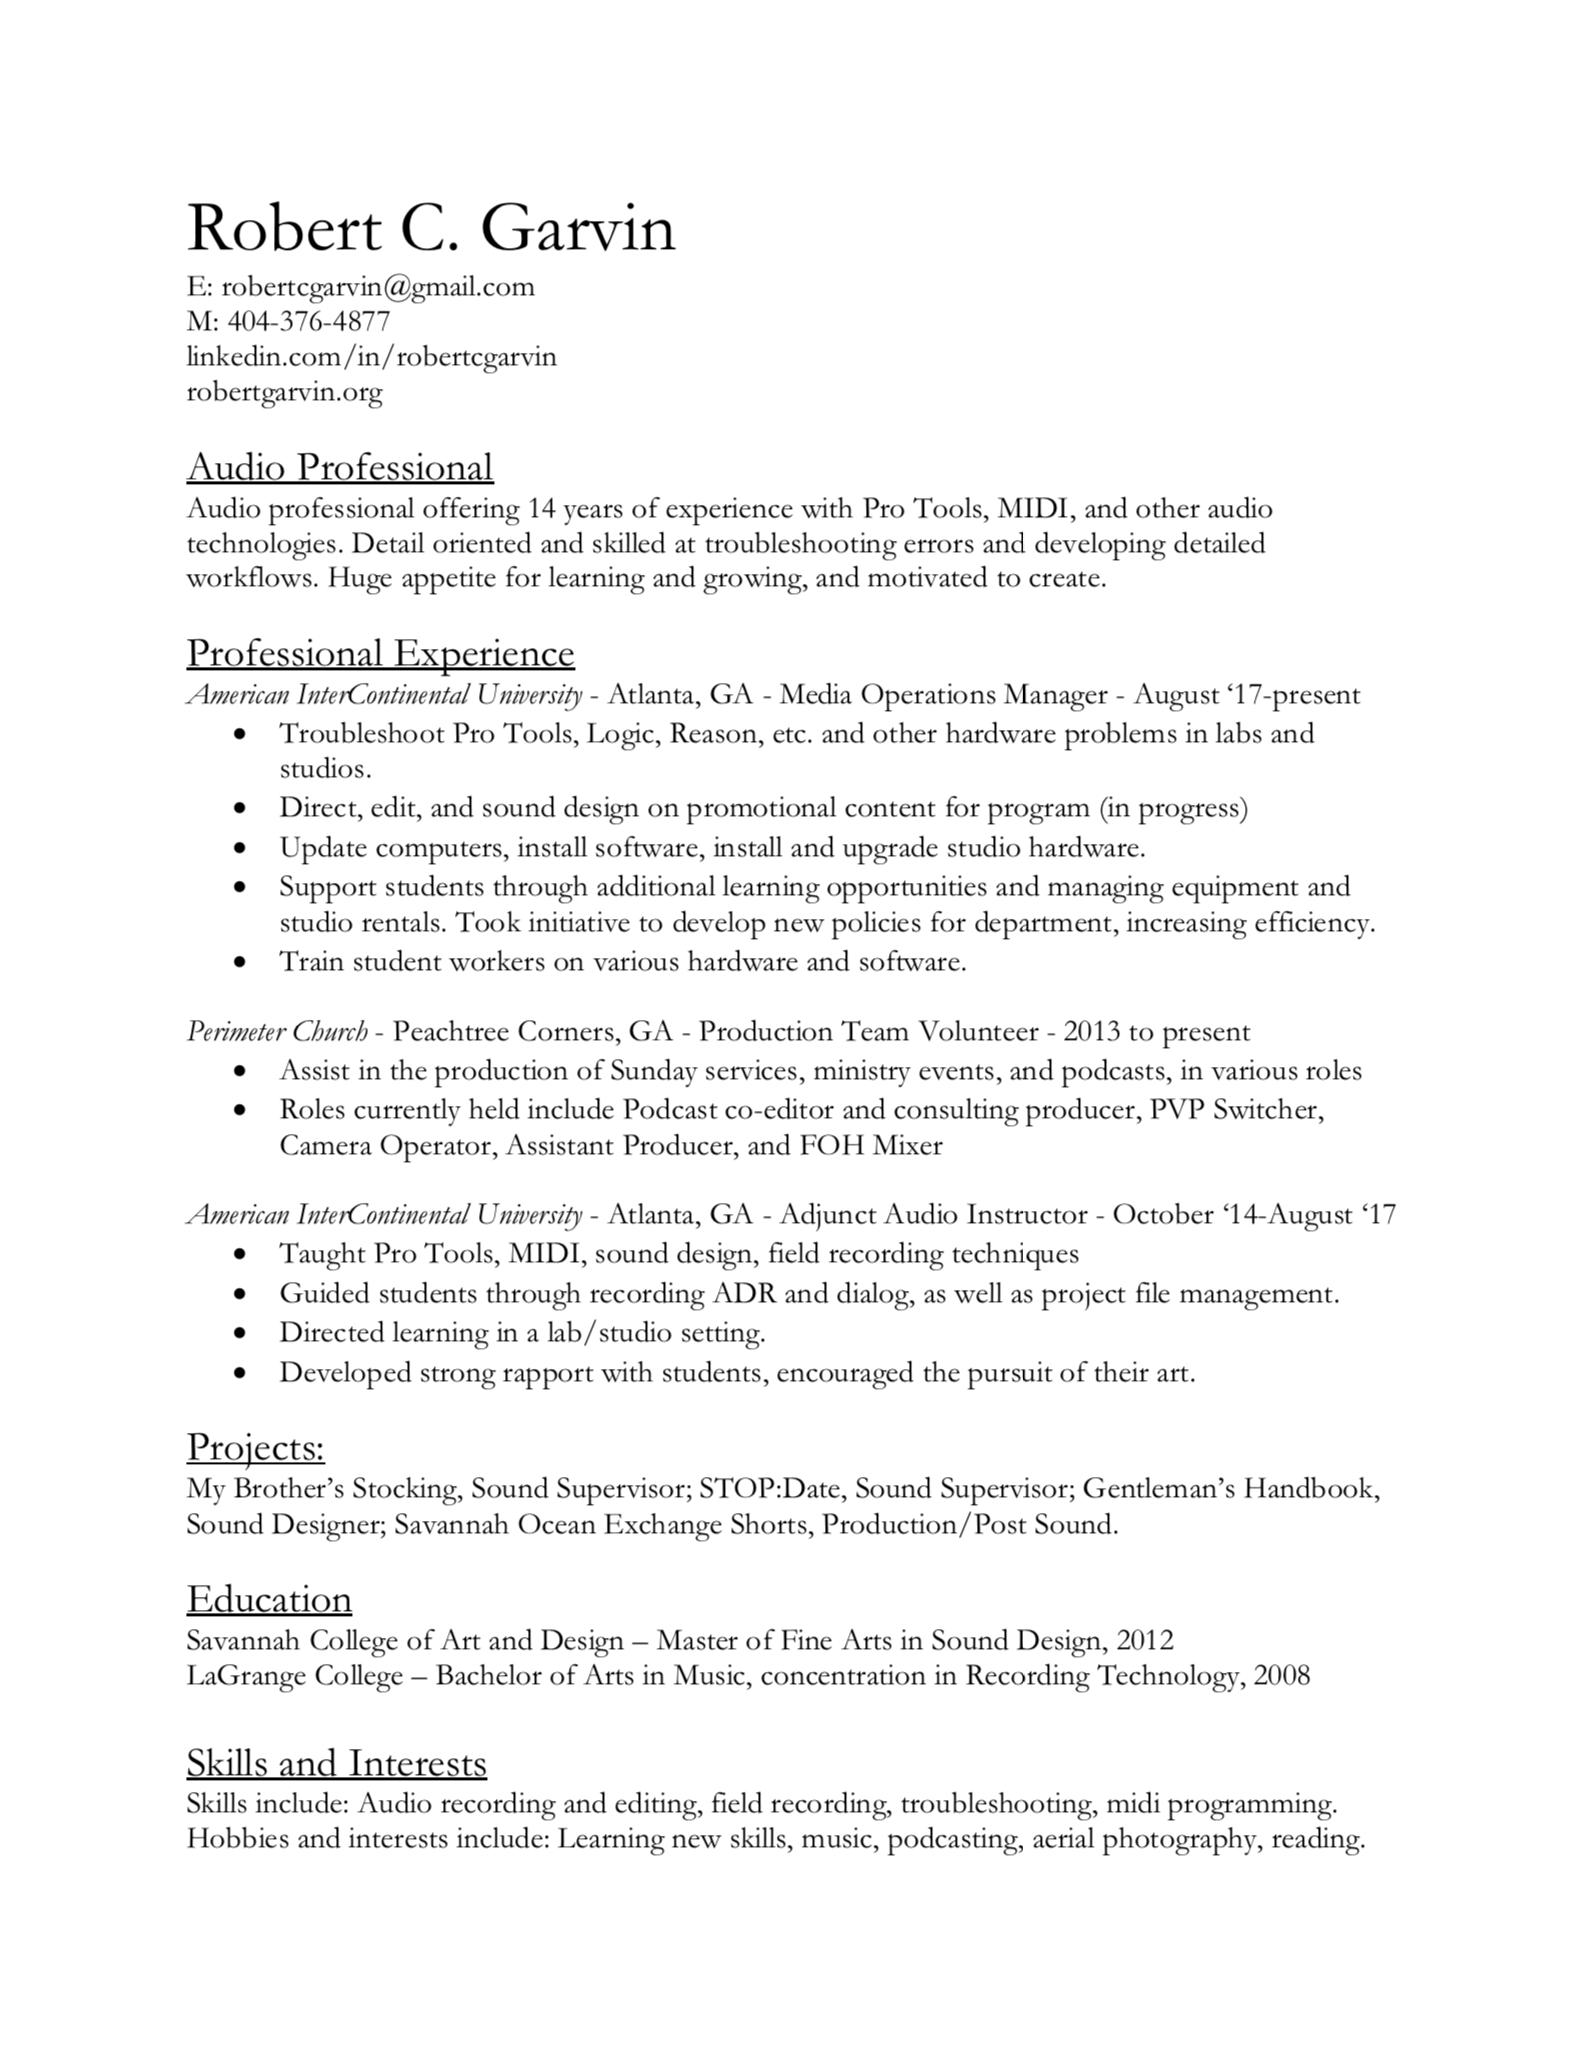 Garvin Resume.png